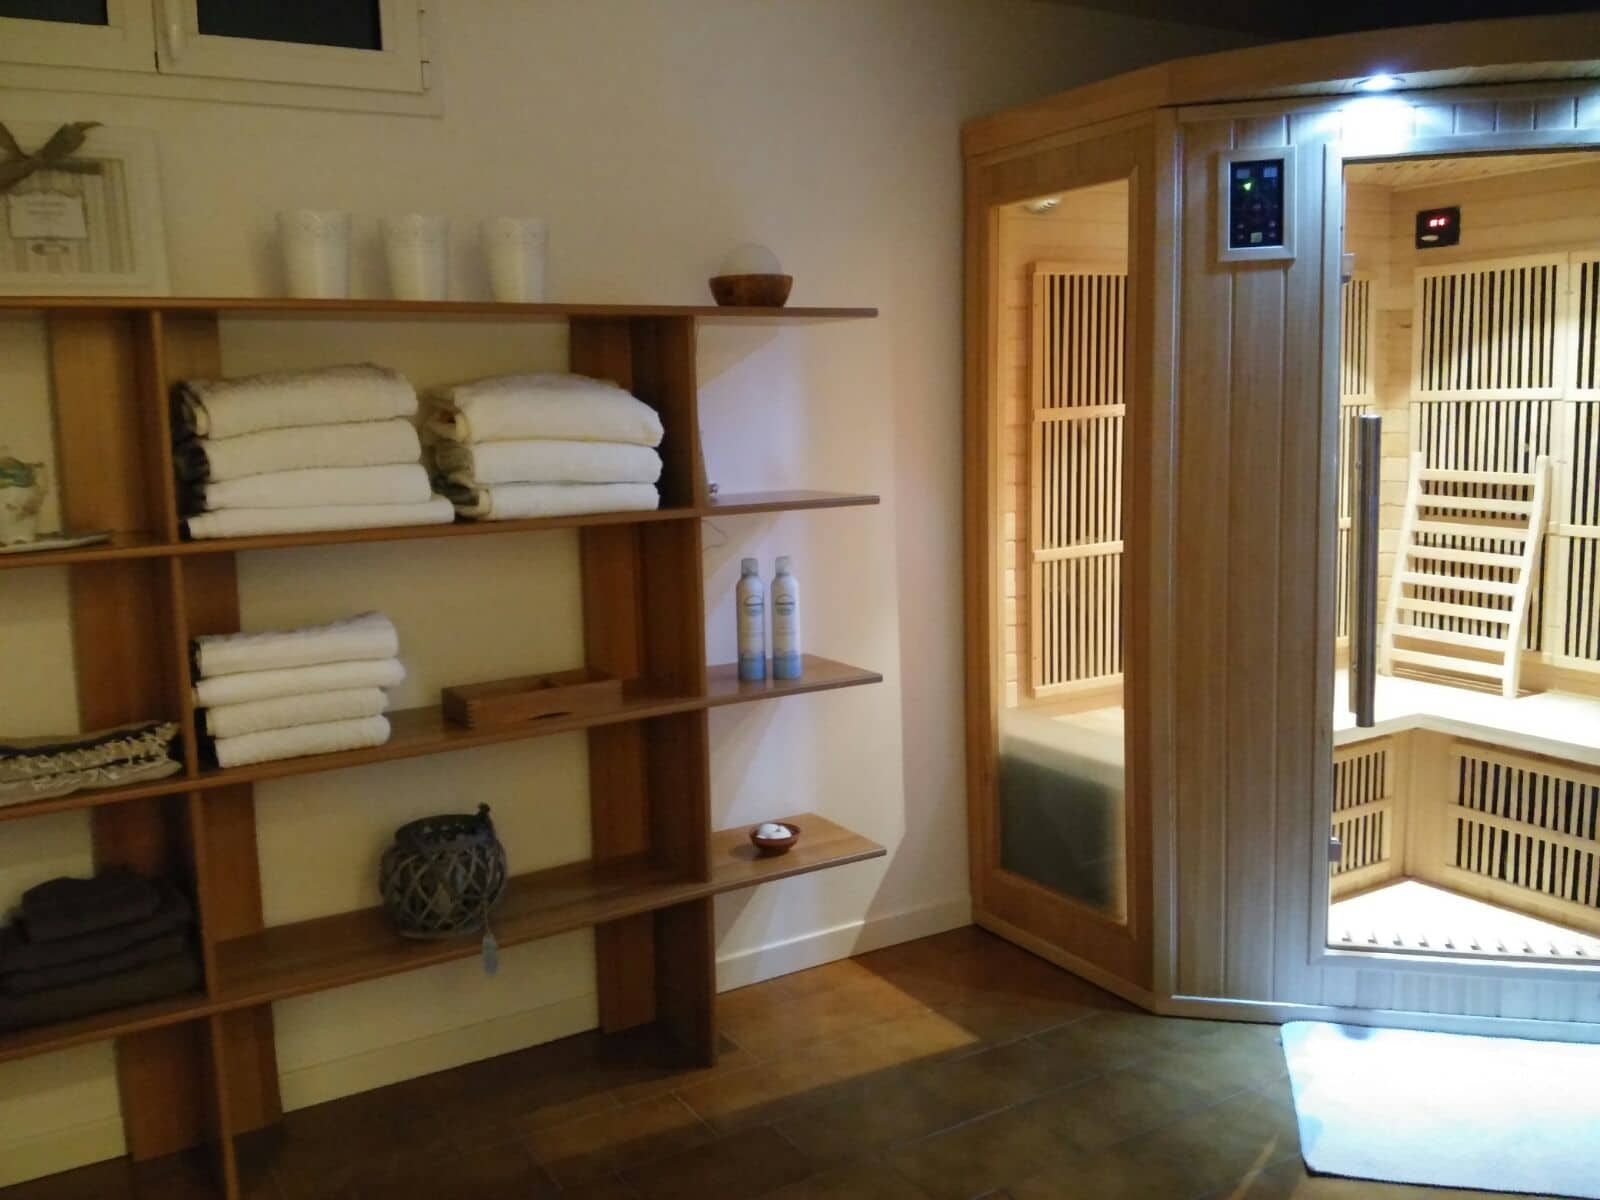 Mini wellness eurorest - Sauna bagno turco differenza ...